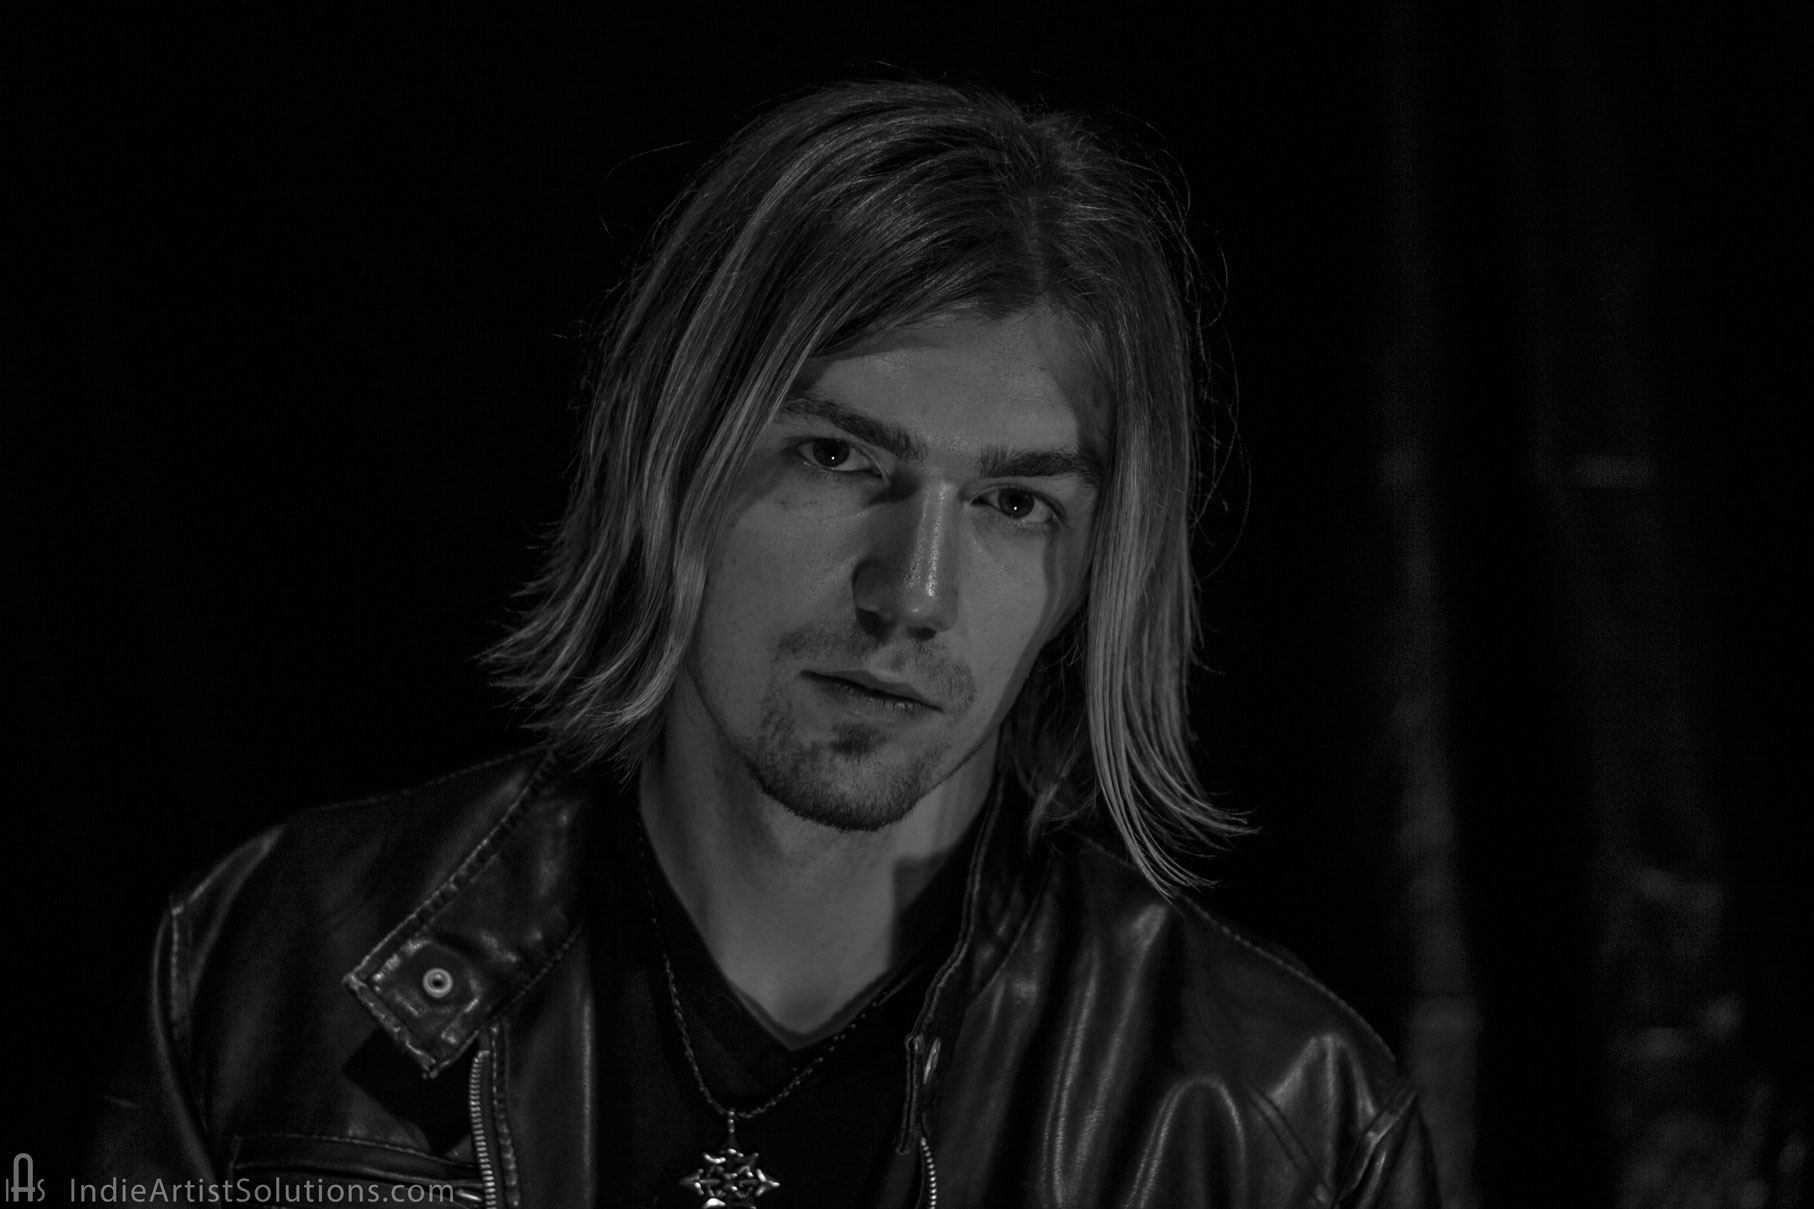 Kent-Diimmel-Kurt Cobain